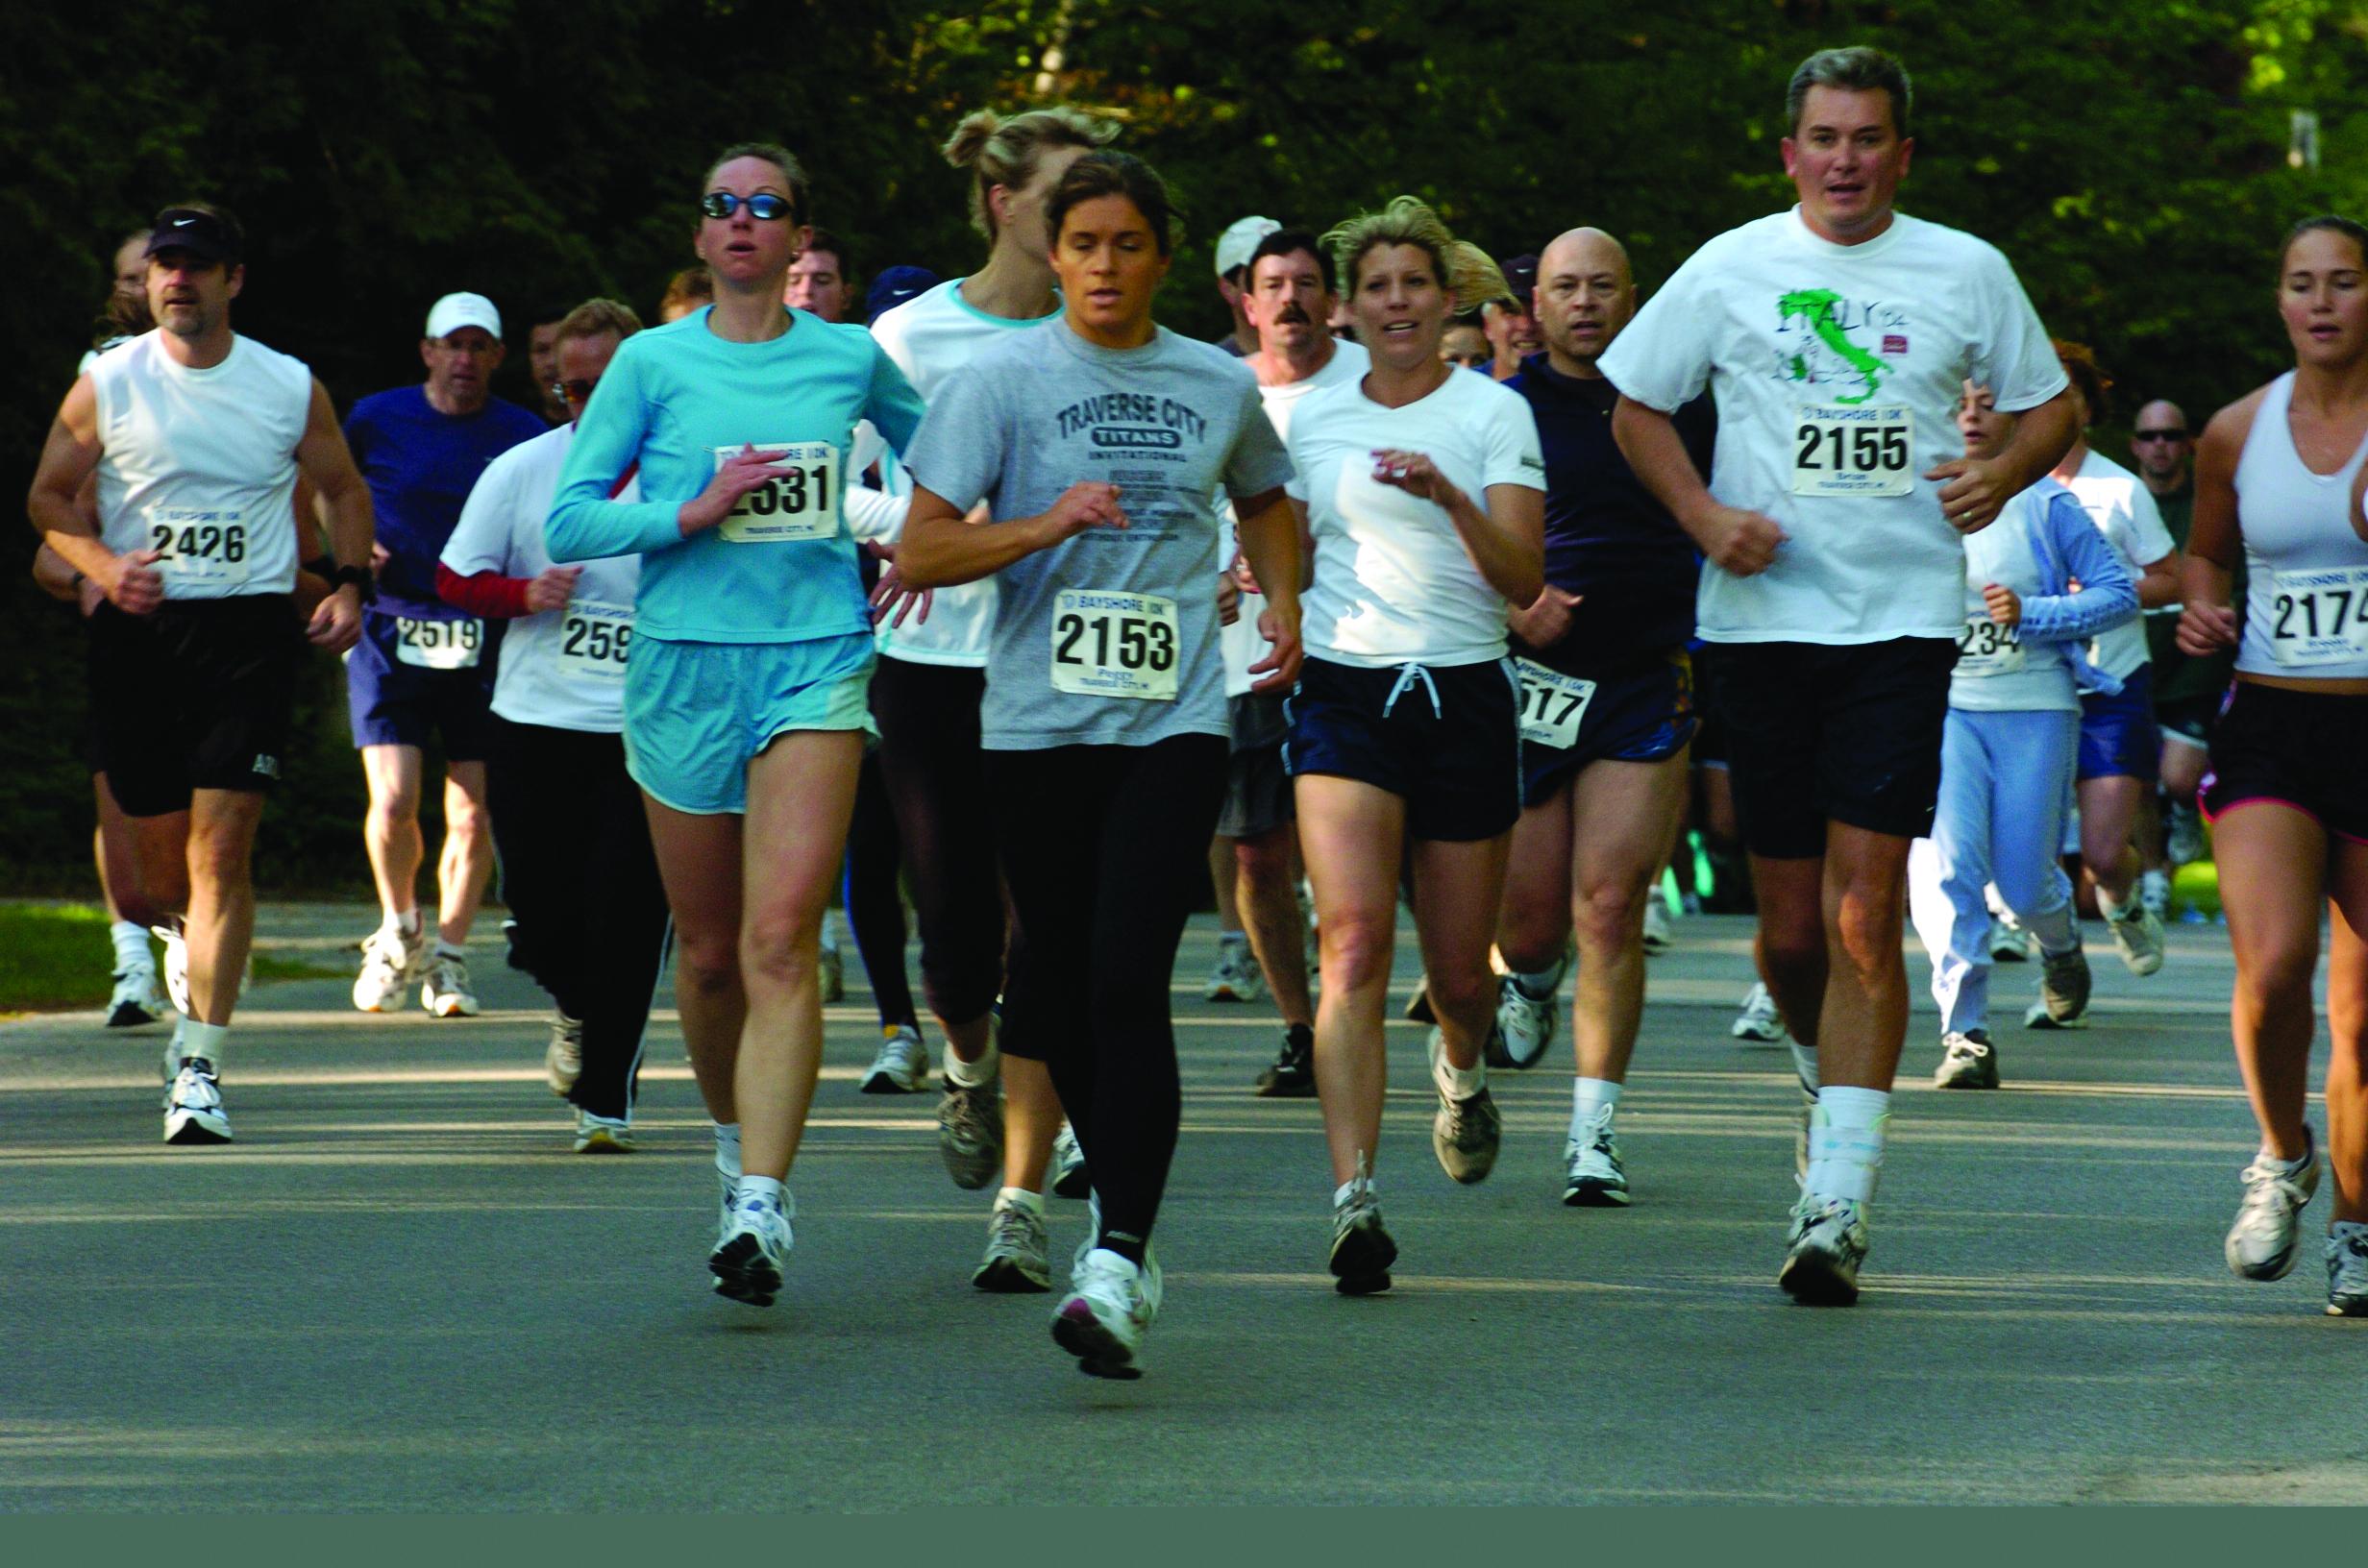 The Bayshore Marathon